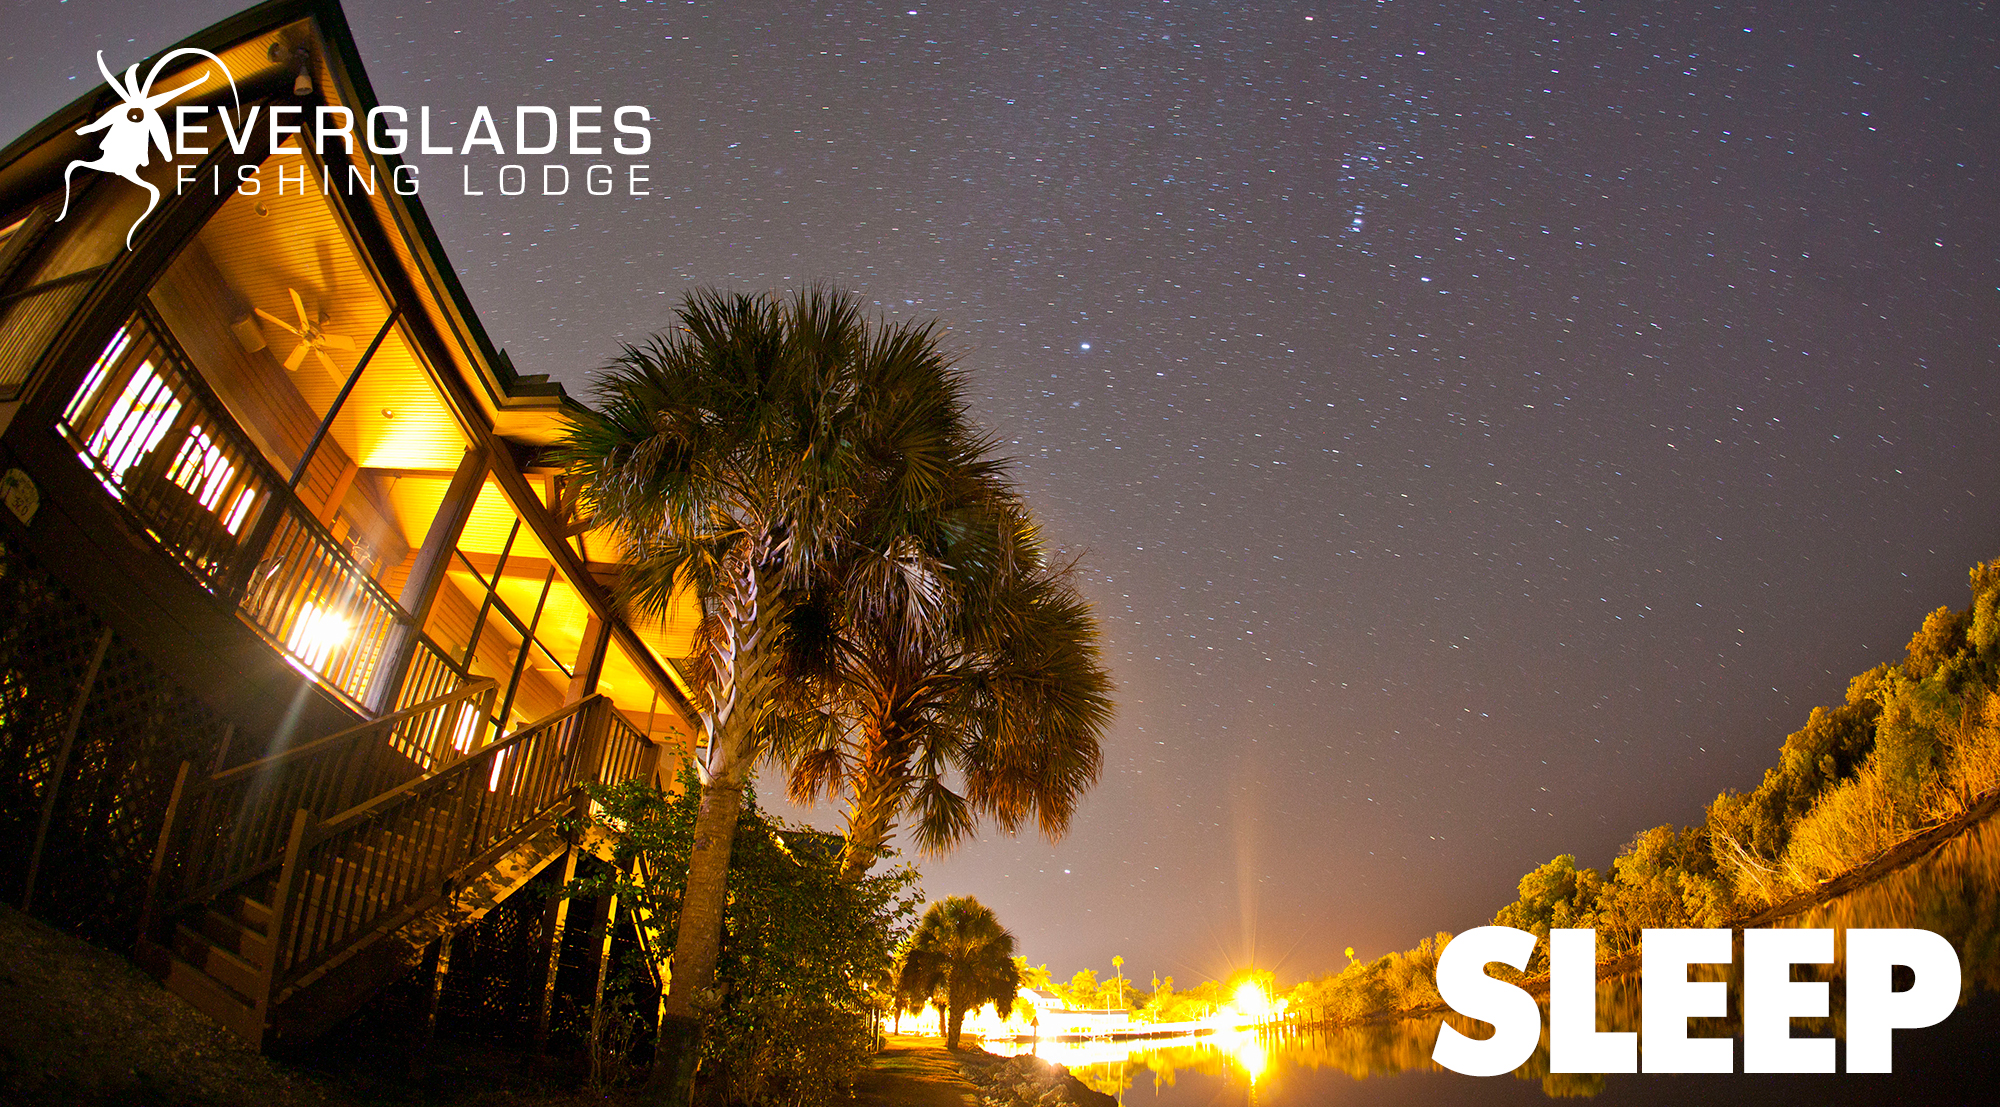 everglades-fishing-lodge.jpg